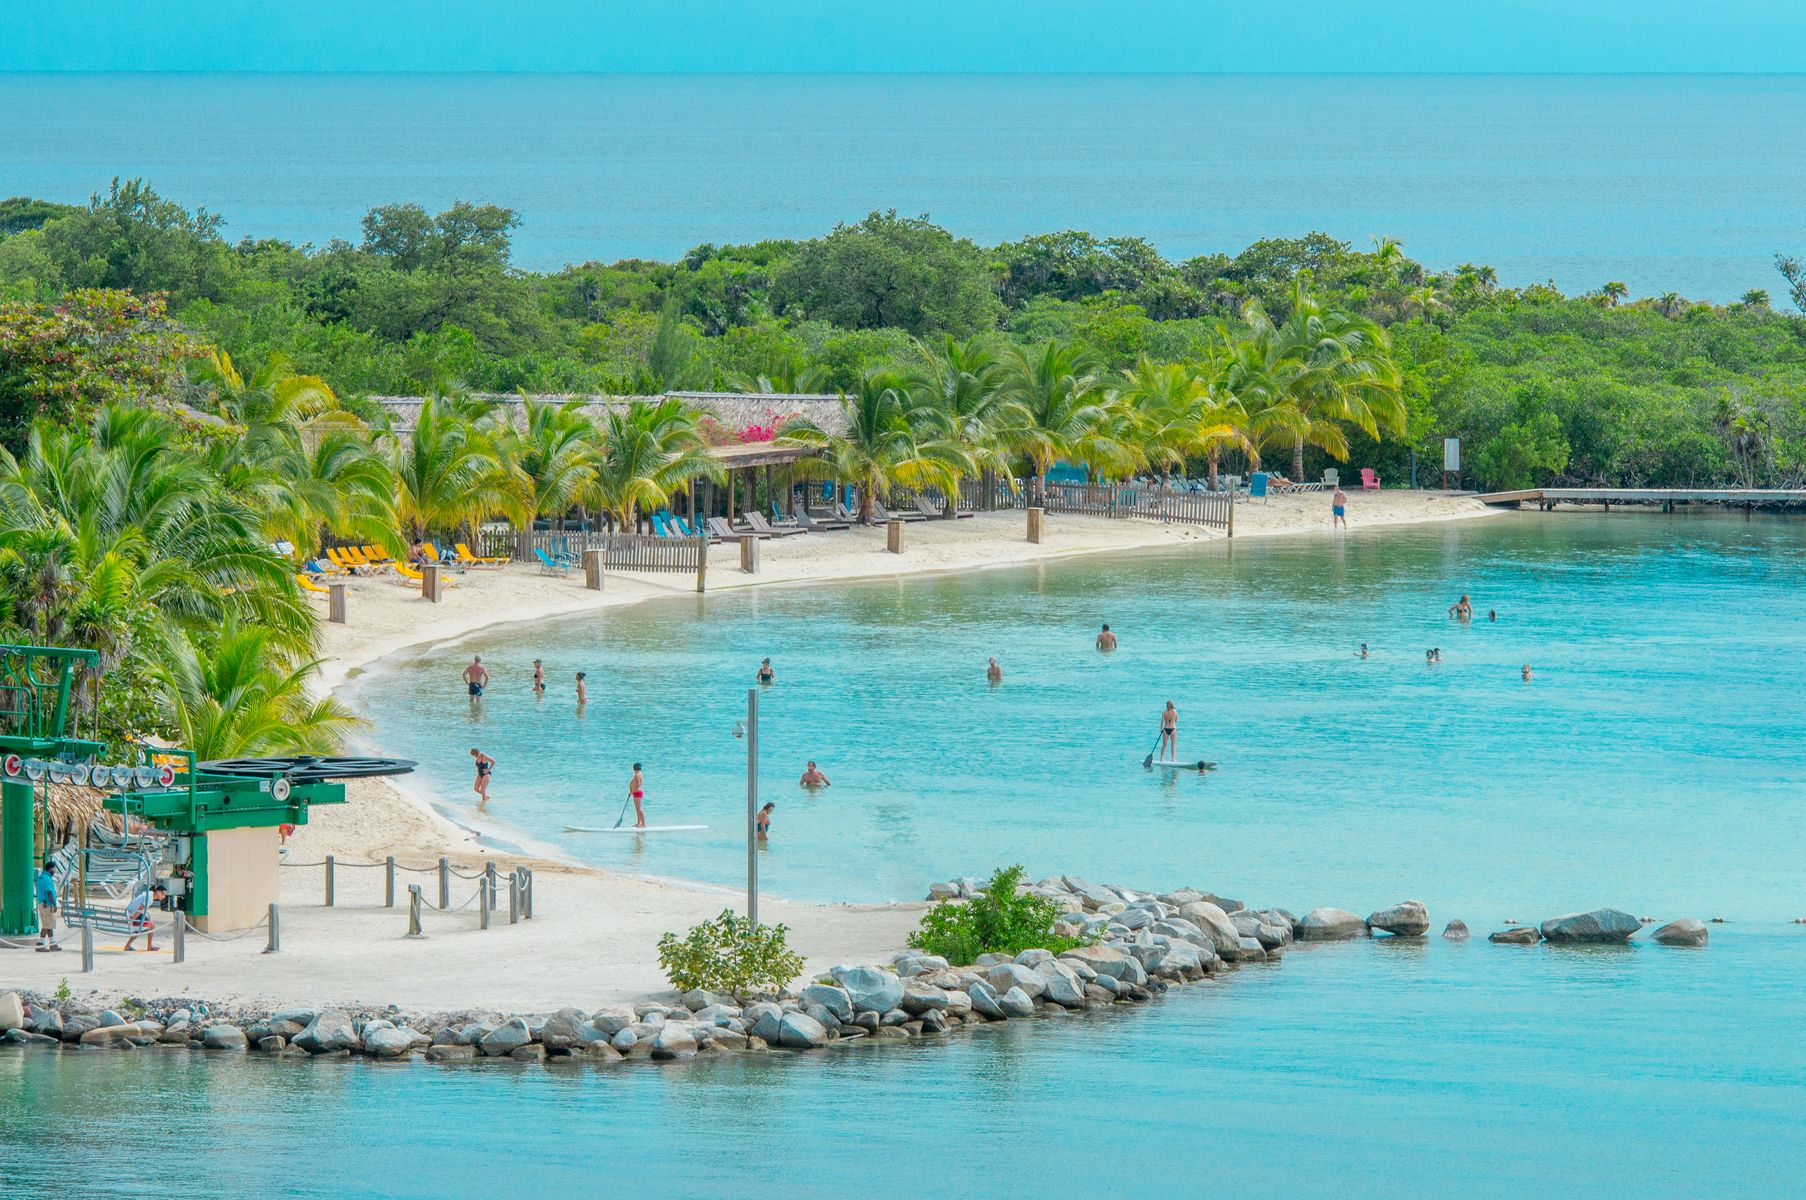 Exuberante, follaje tropical en la playa en la isla de Roatan, Honduras